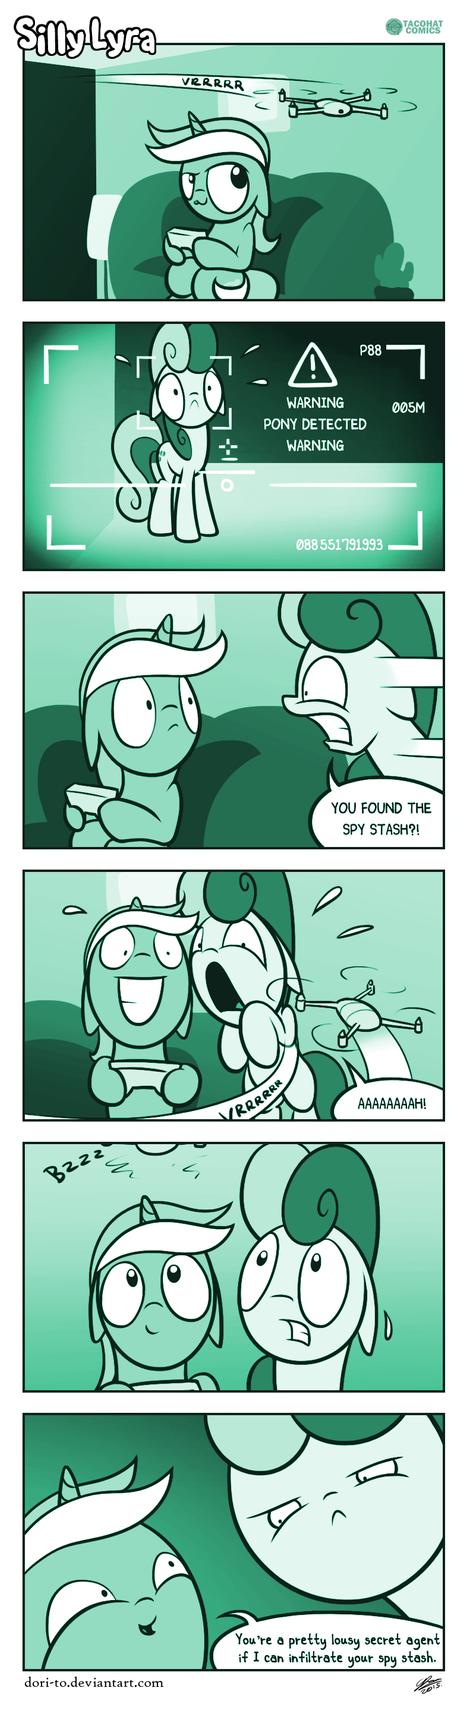 Silly Lyra - Air Strike by Dori-to